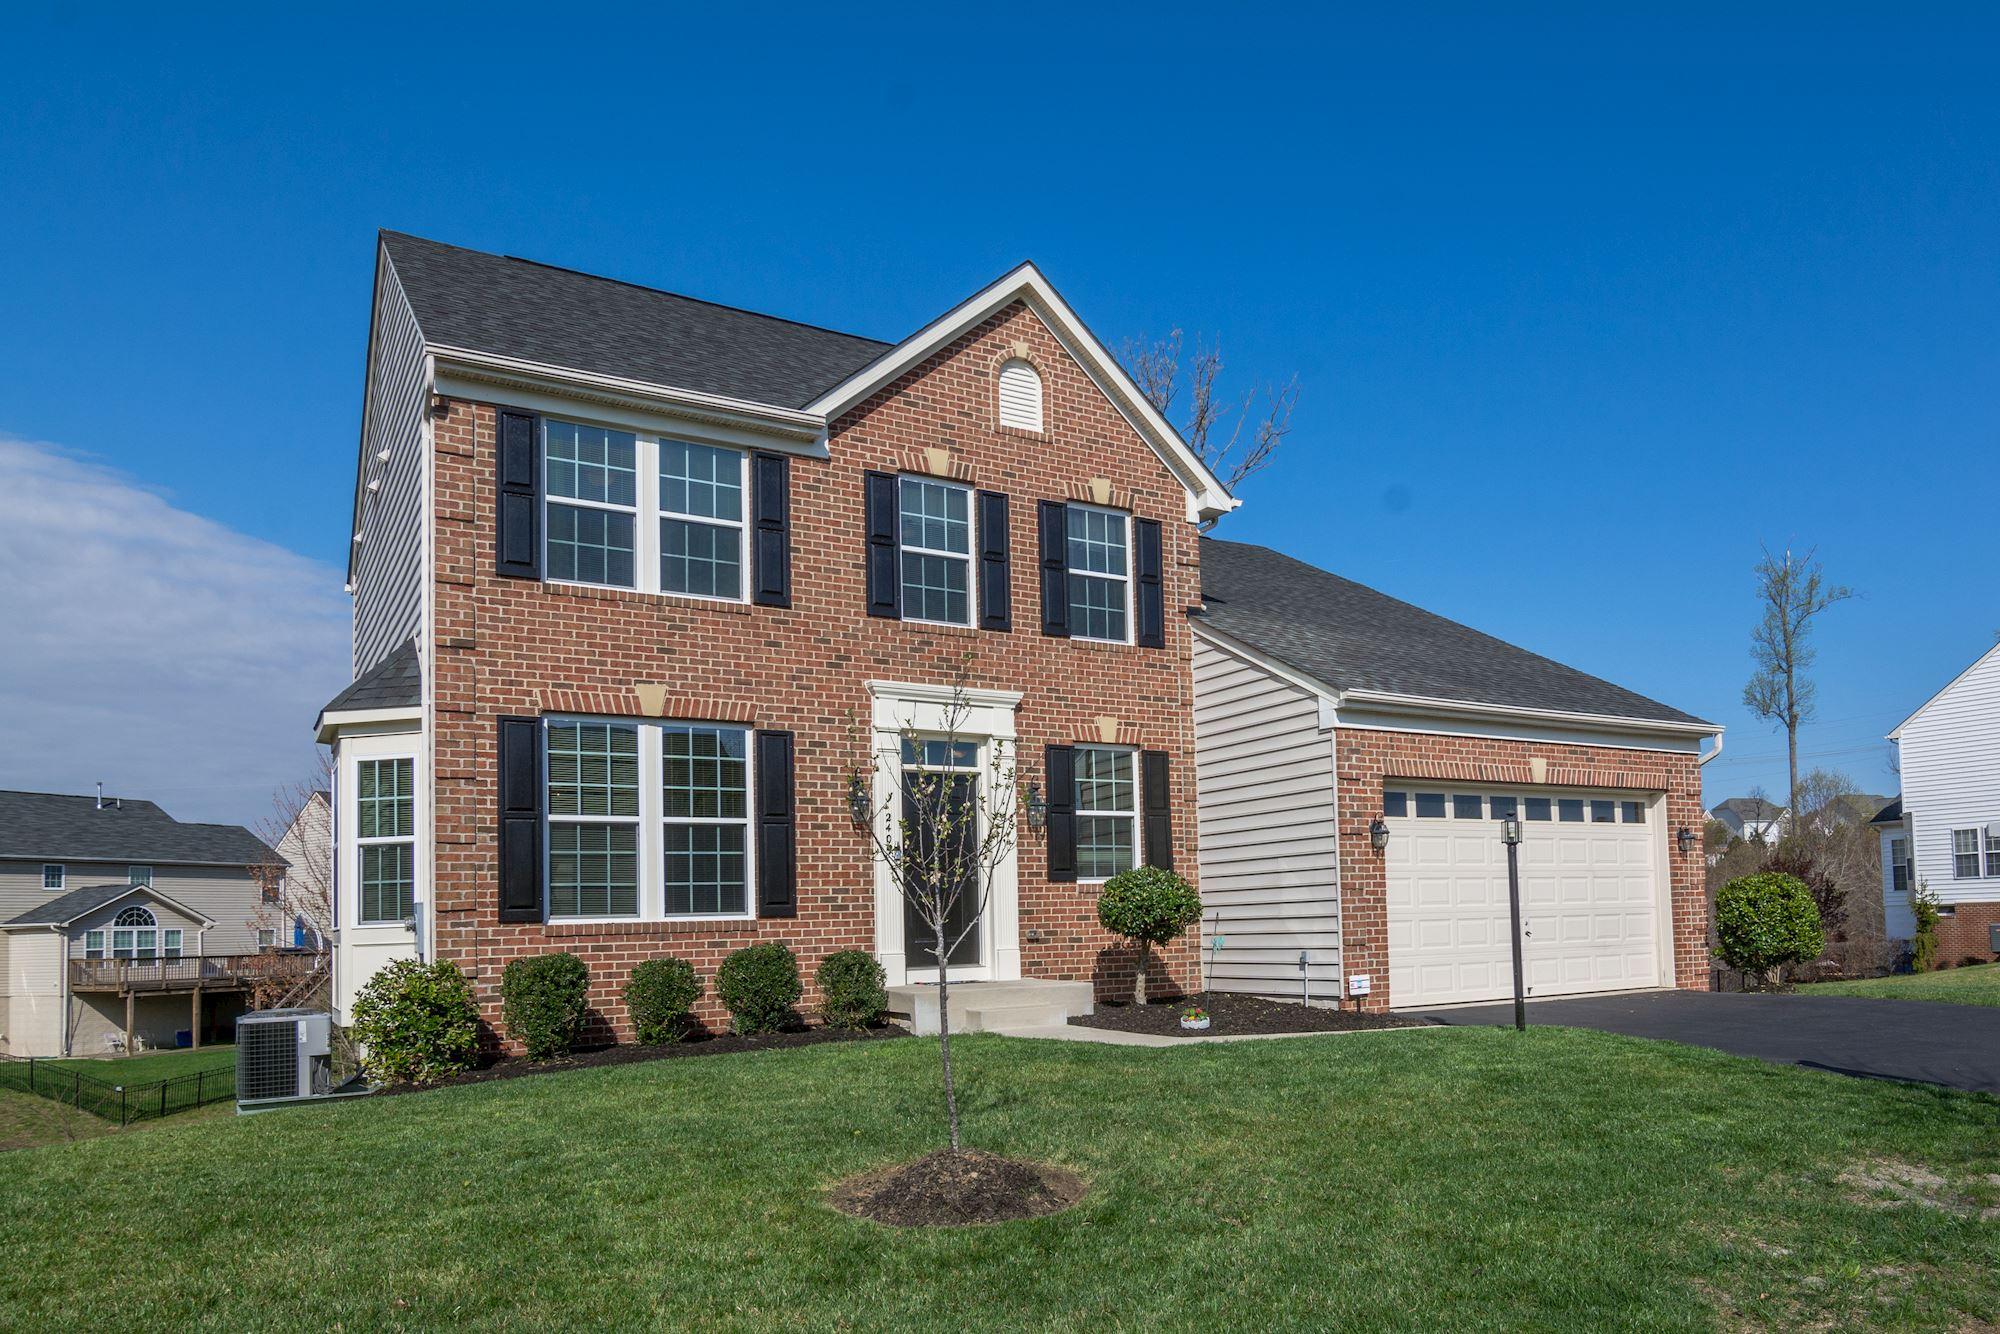 NEW LISTING: 4 BD Corner Lot Home in Woodbridge,VA